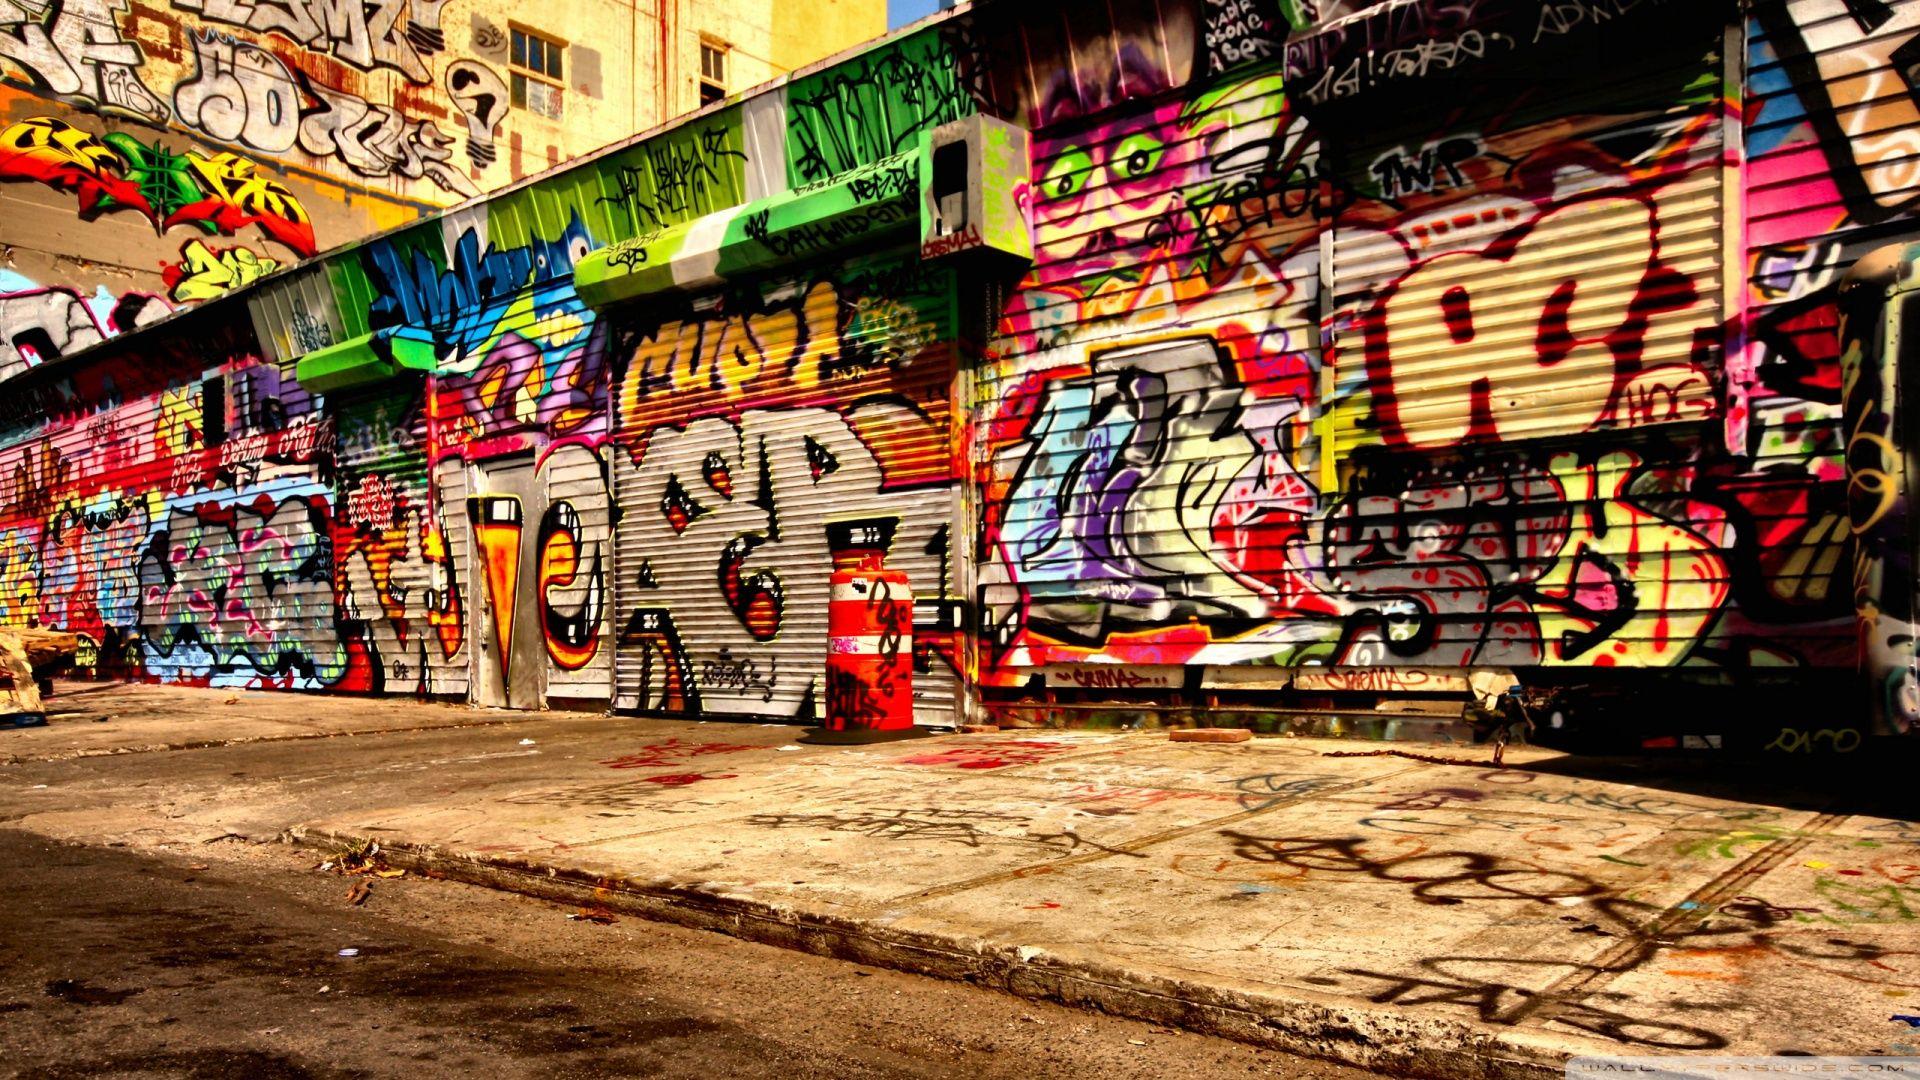 Graffiti art wallpaper for walls - Hd Graffiti Wallpapers Wallpaper Hd Wallpapers Pinterest Graffiti Wallpaper Graffiti And Wallpaper